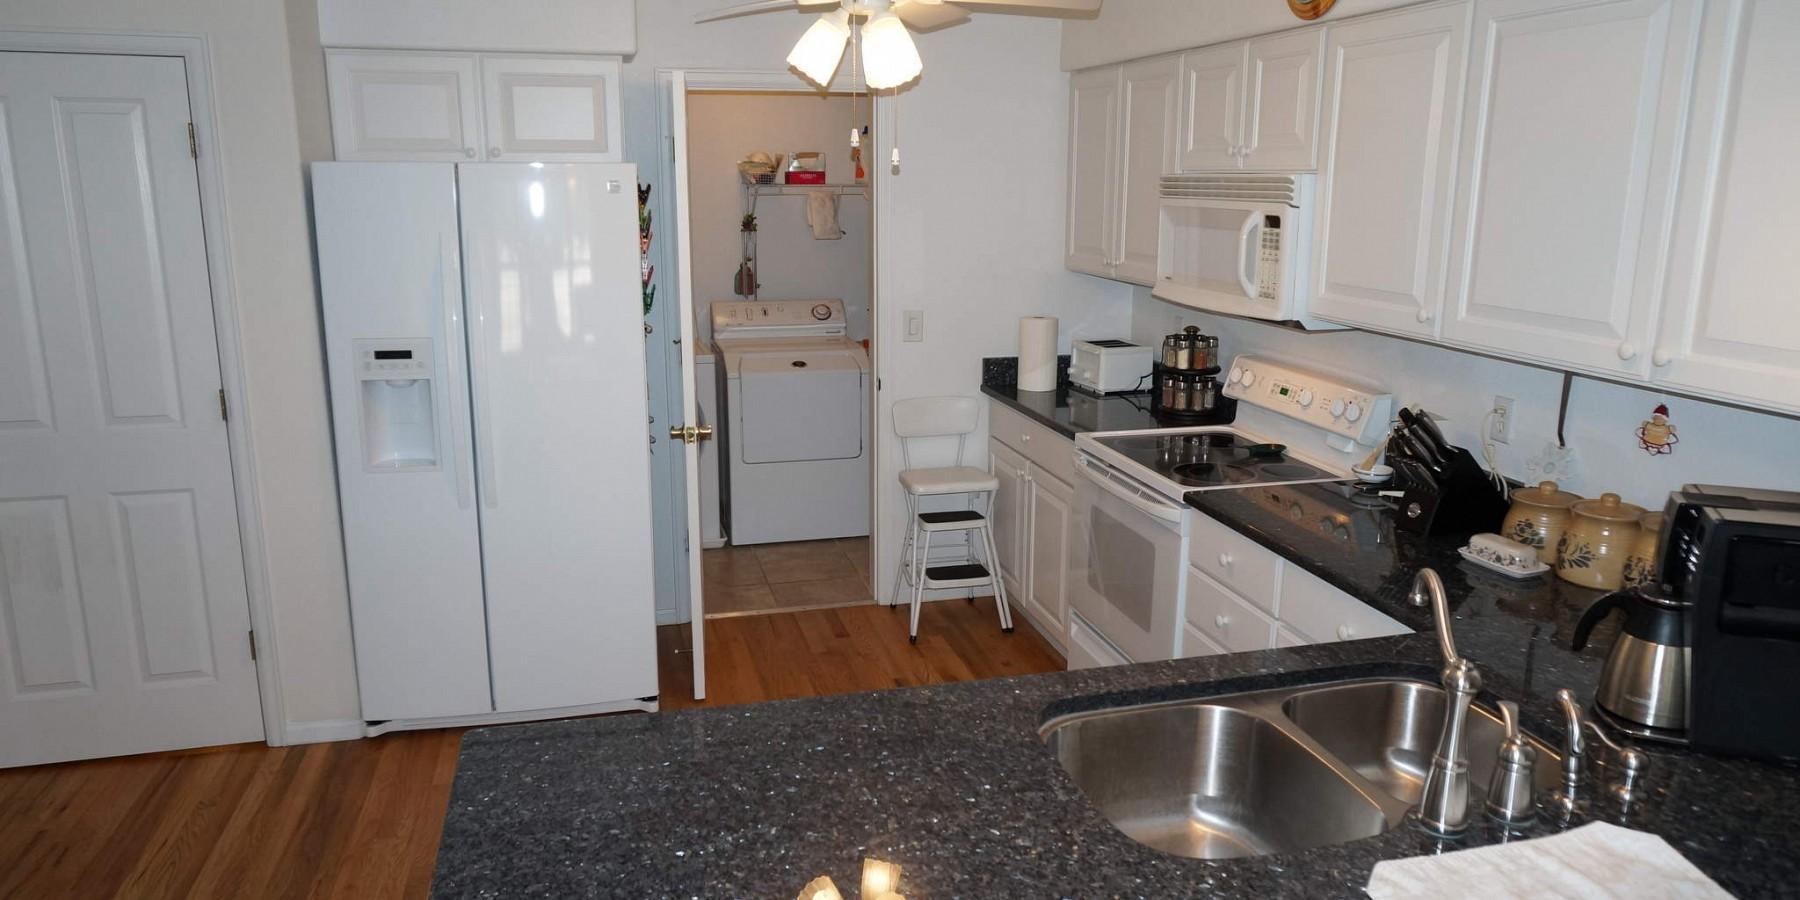 7700 W Grant Ranch Blvd #9B, Littleton, CO 80123